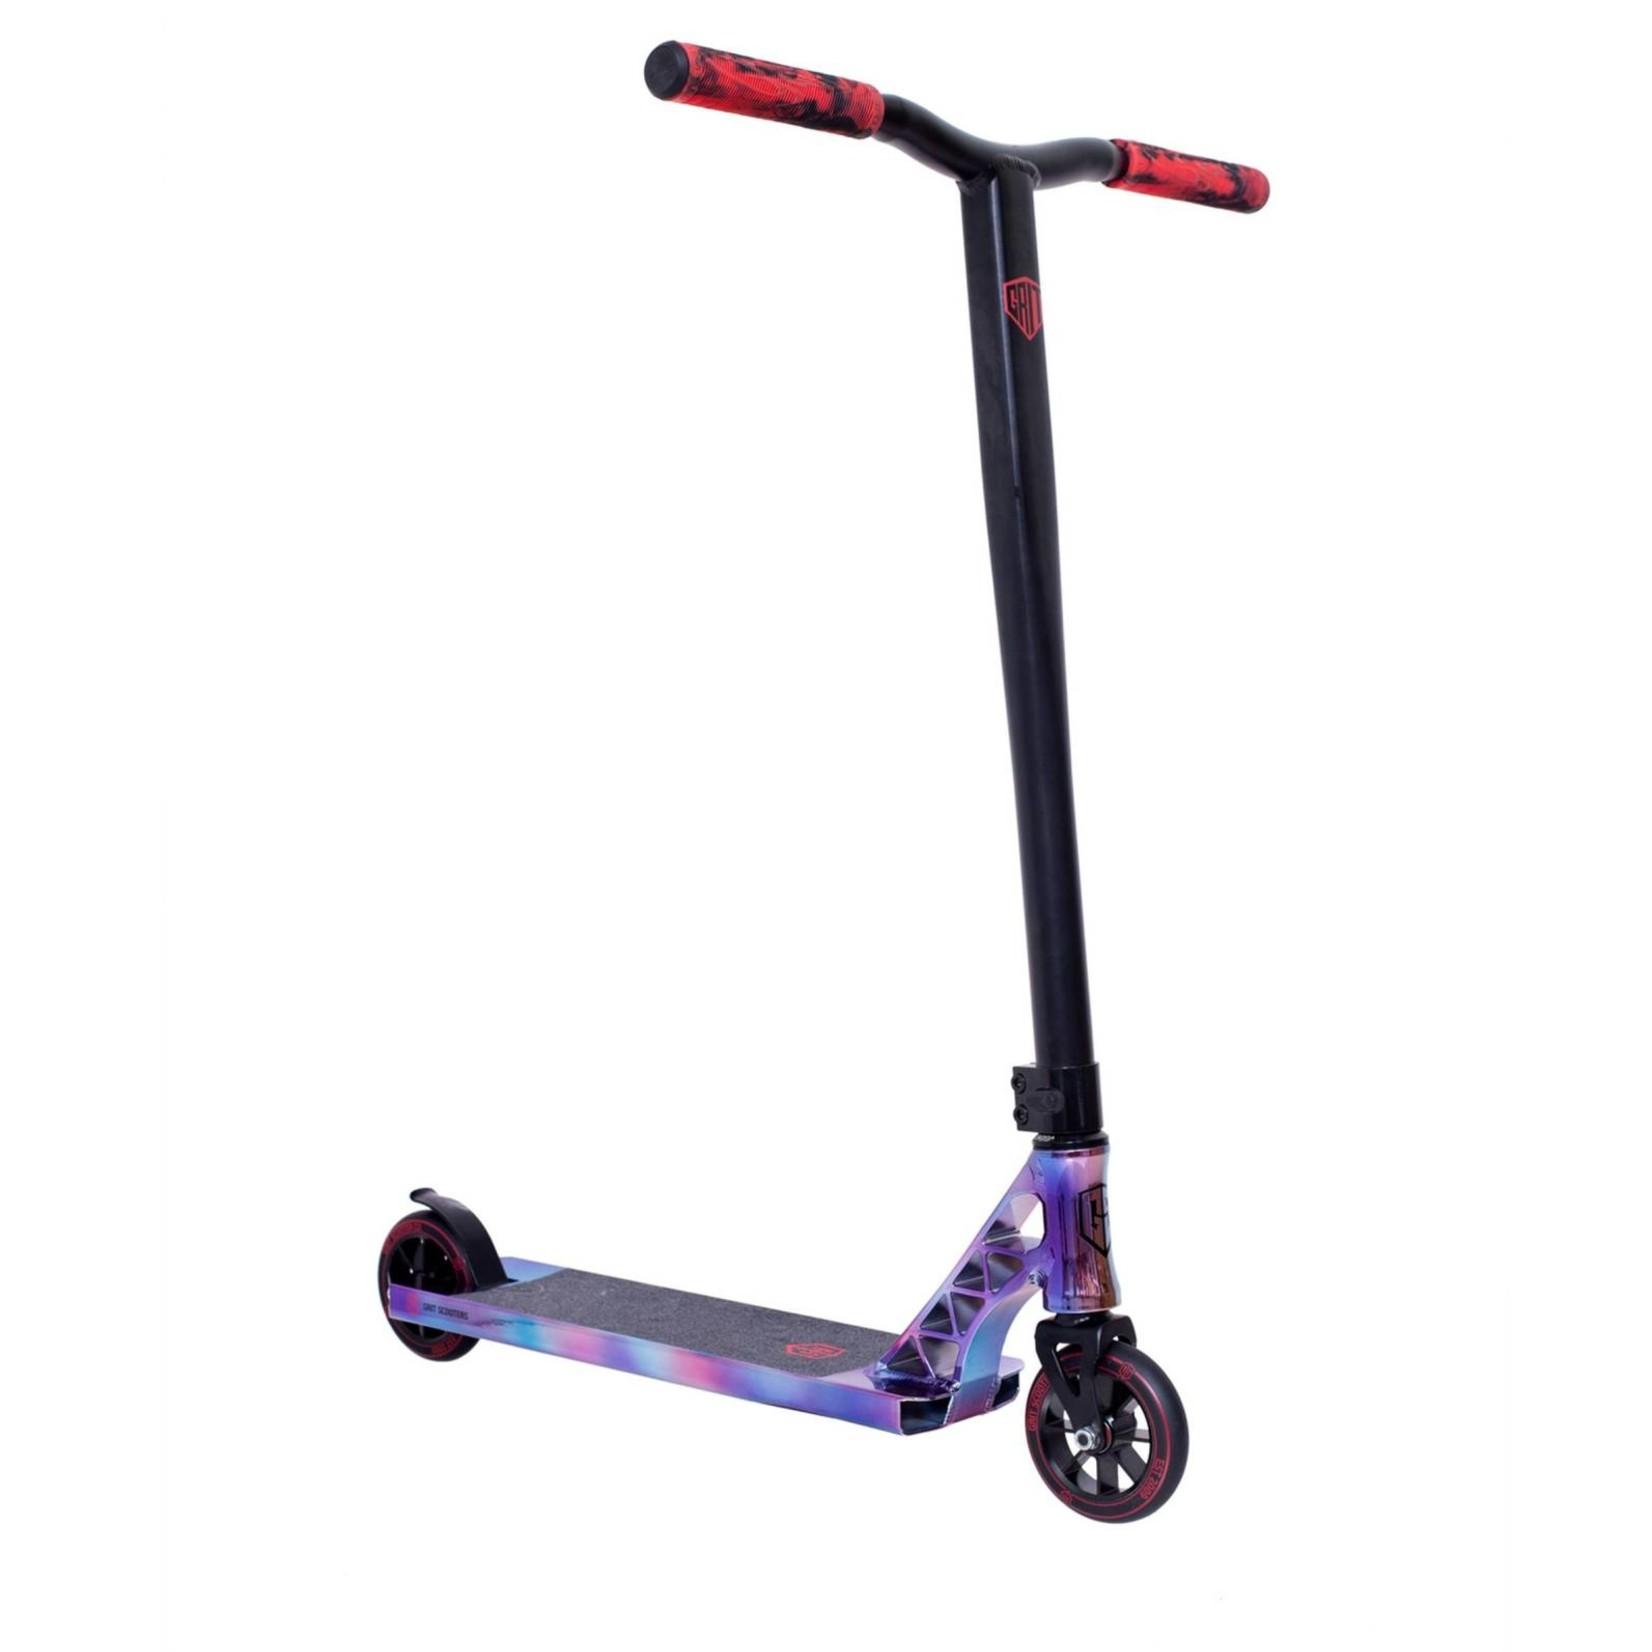 GRIT Grit Elite 2021 Neo Painted / Satin  Black Scooter